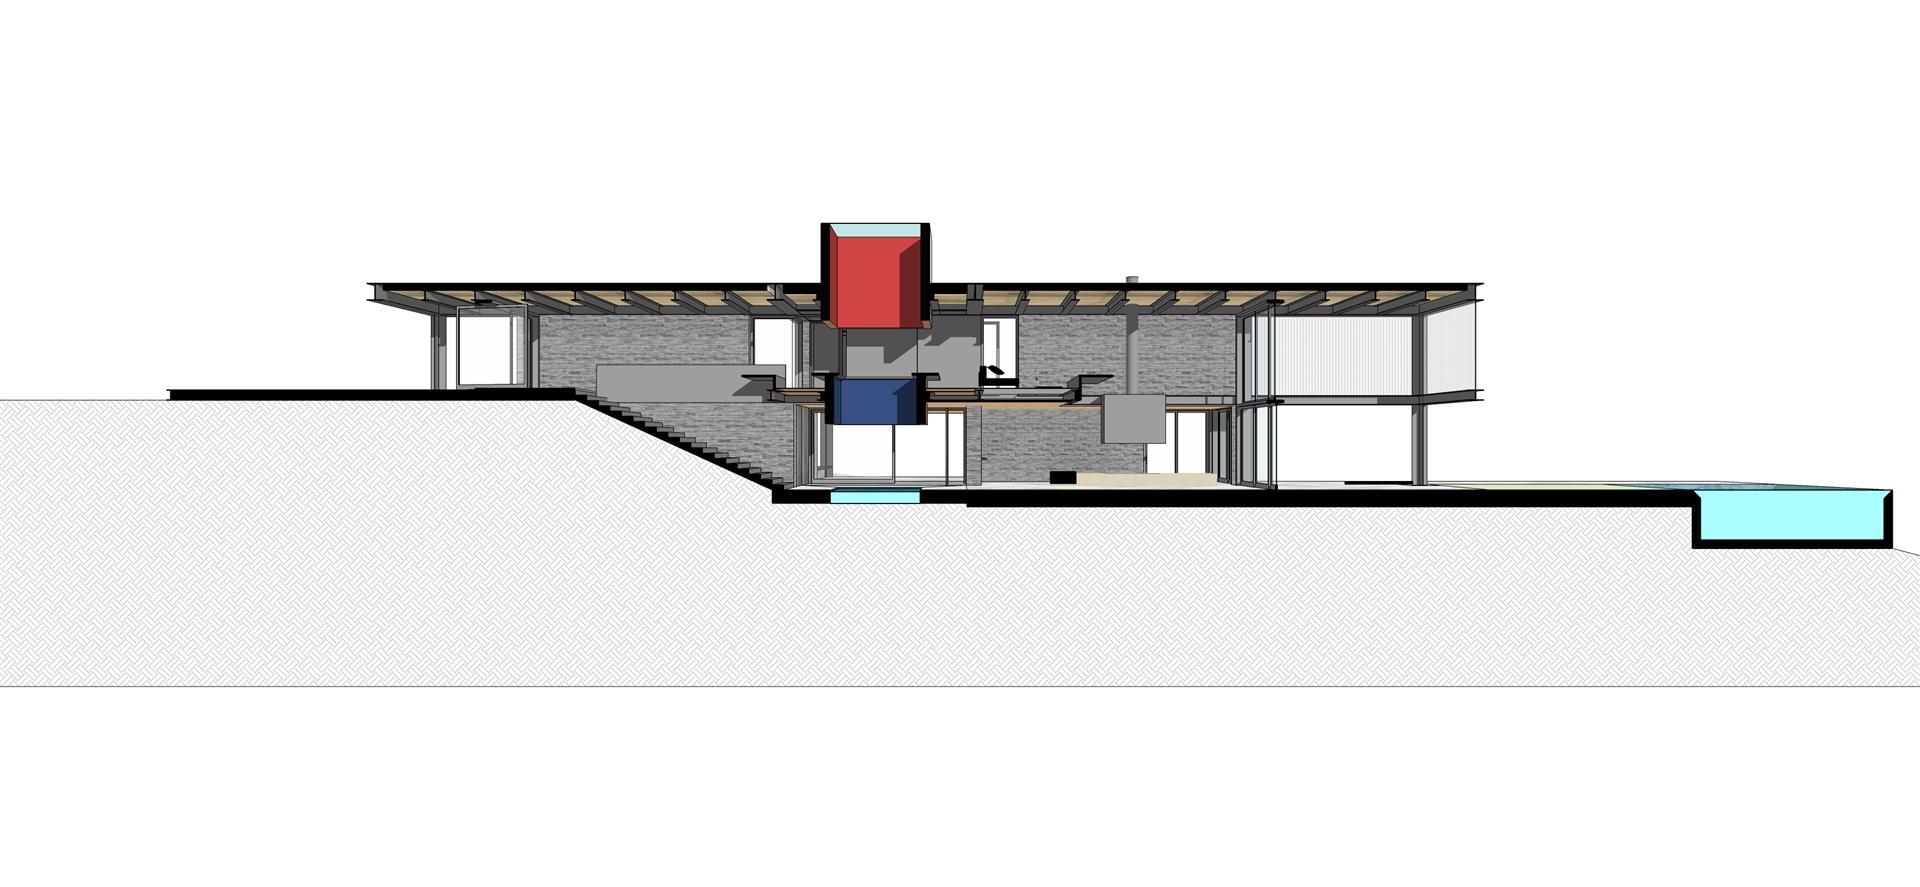 JGM Lindoia 2013 08 29 (17).jpg